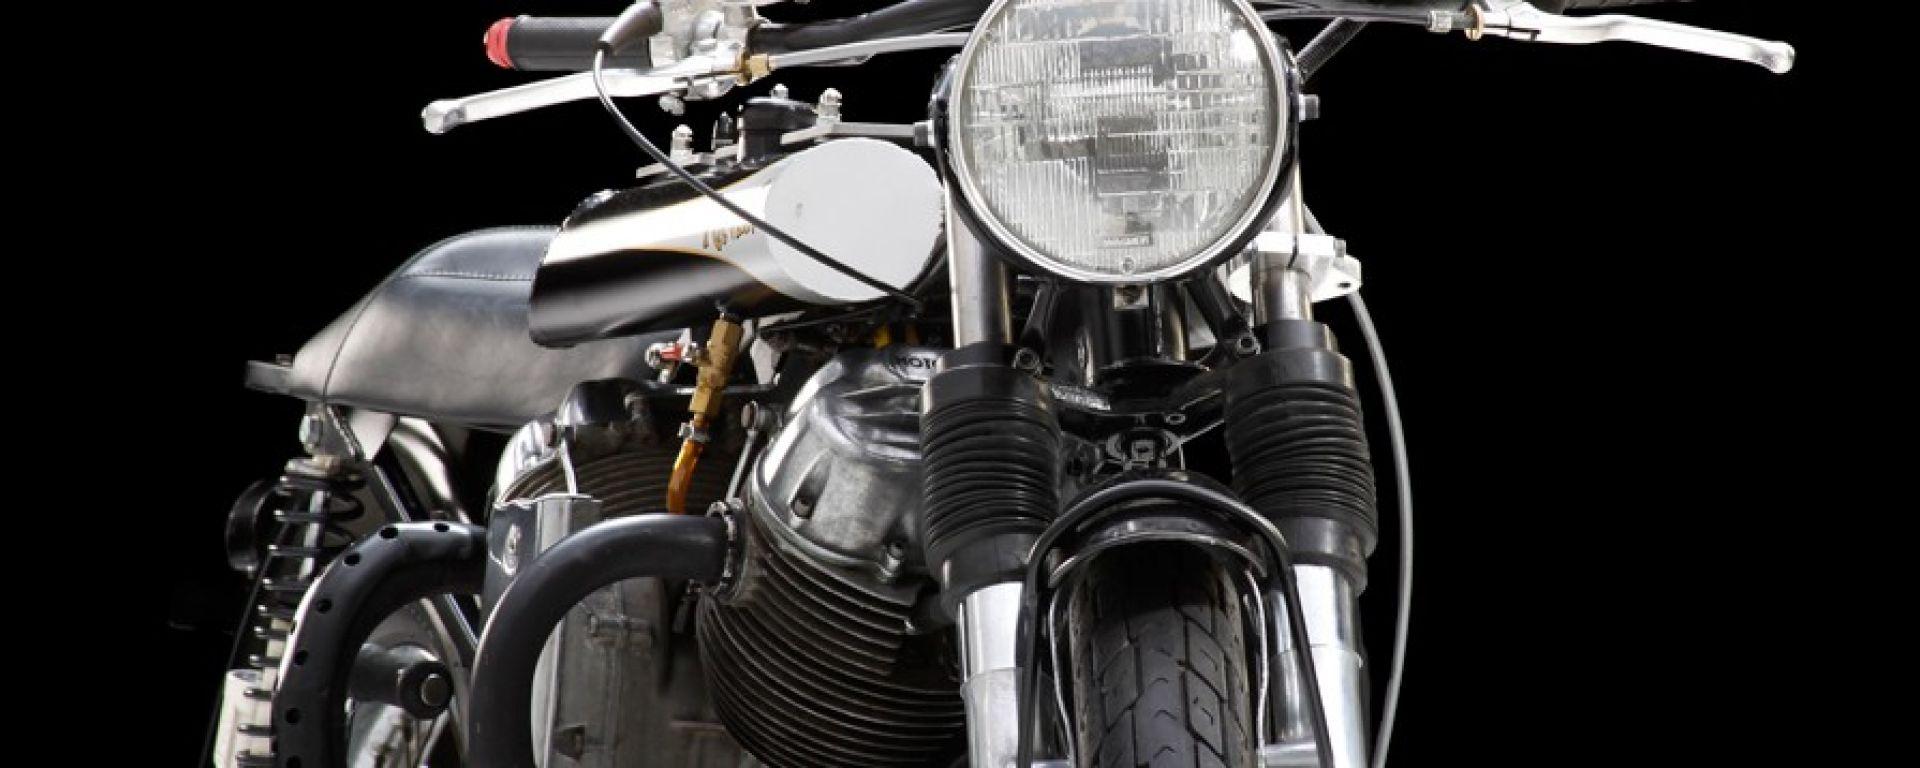 Raven MotoCycles